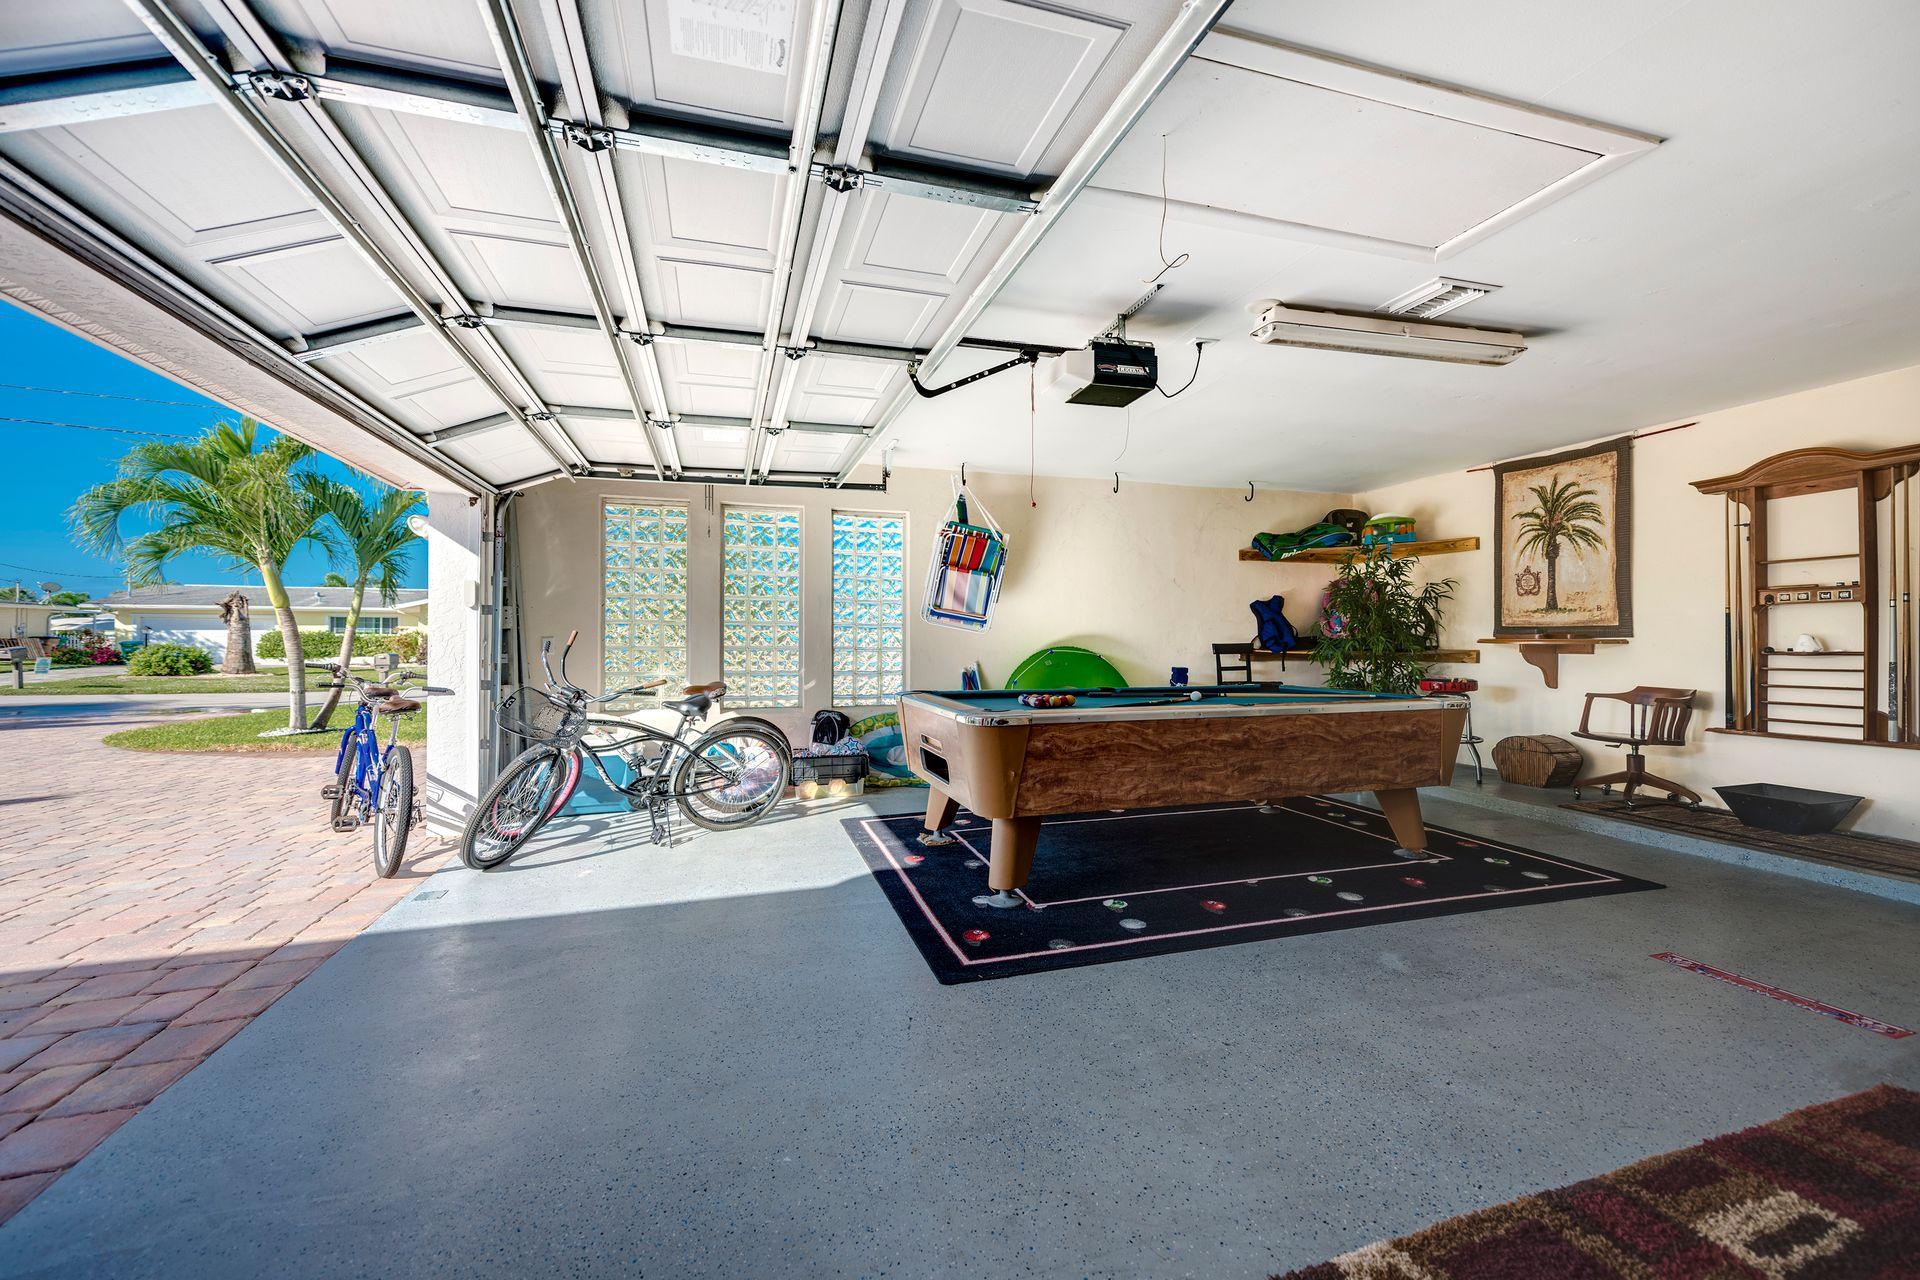 Pool Table / Bikes